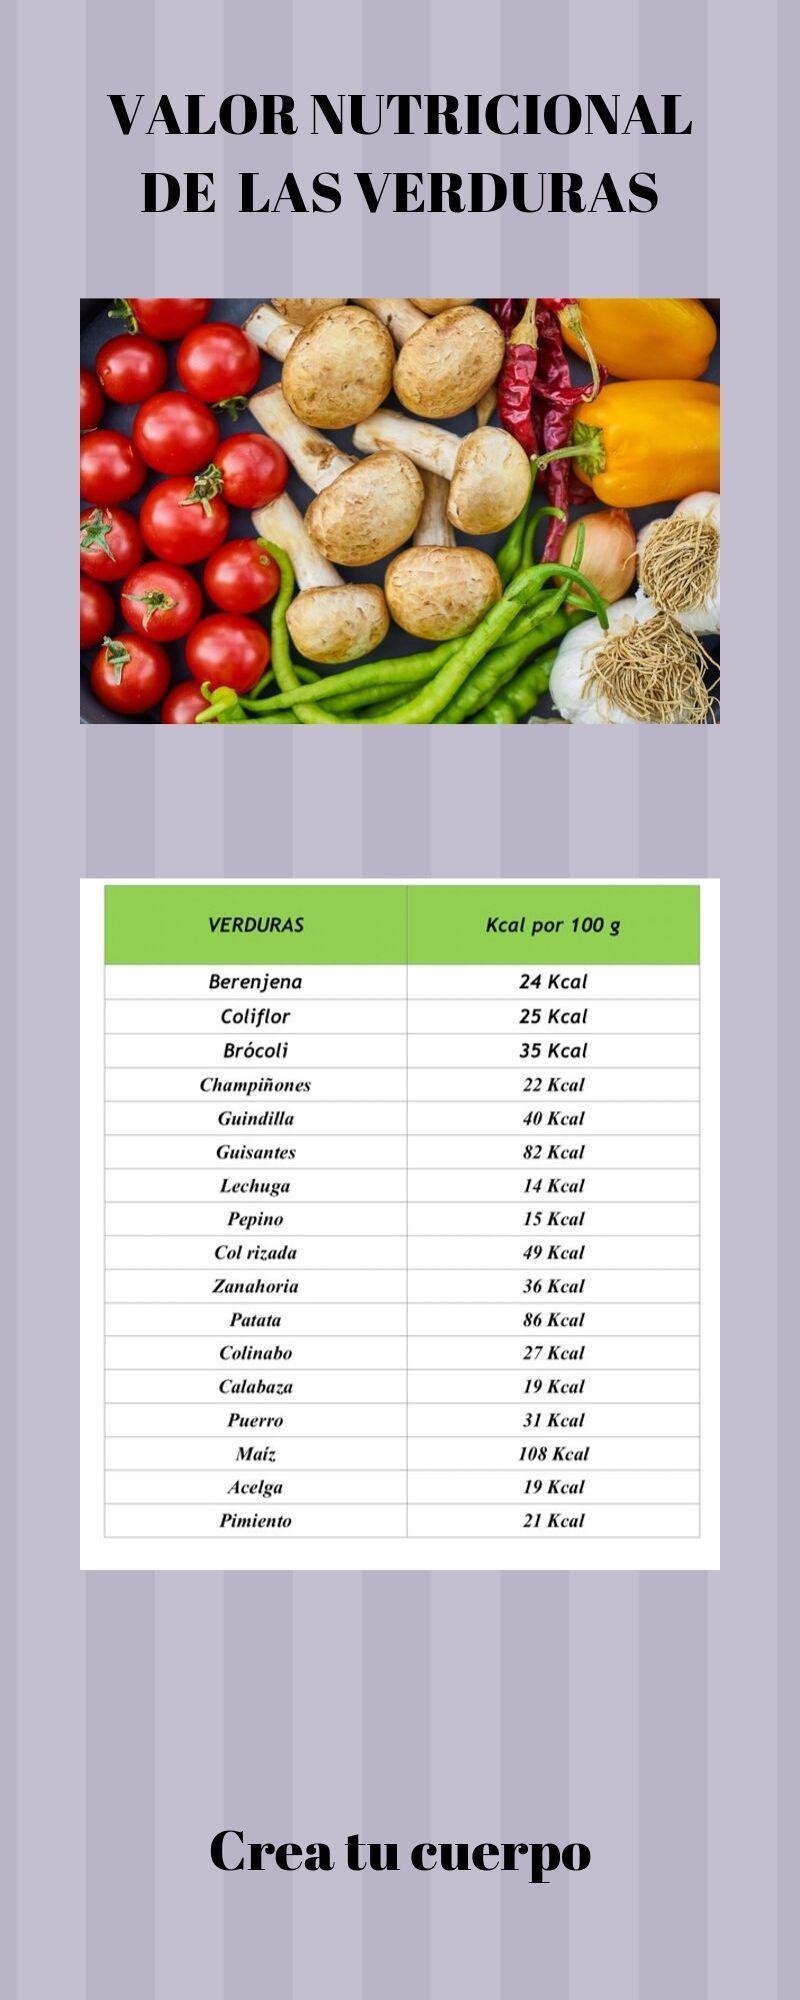 Tabla de calorías de las verduras